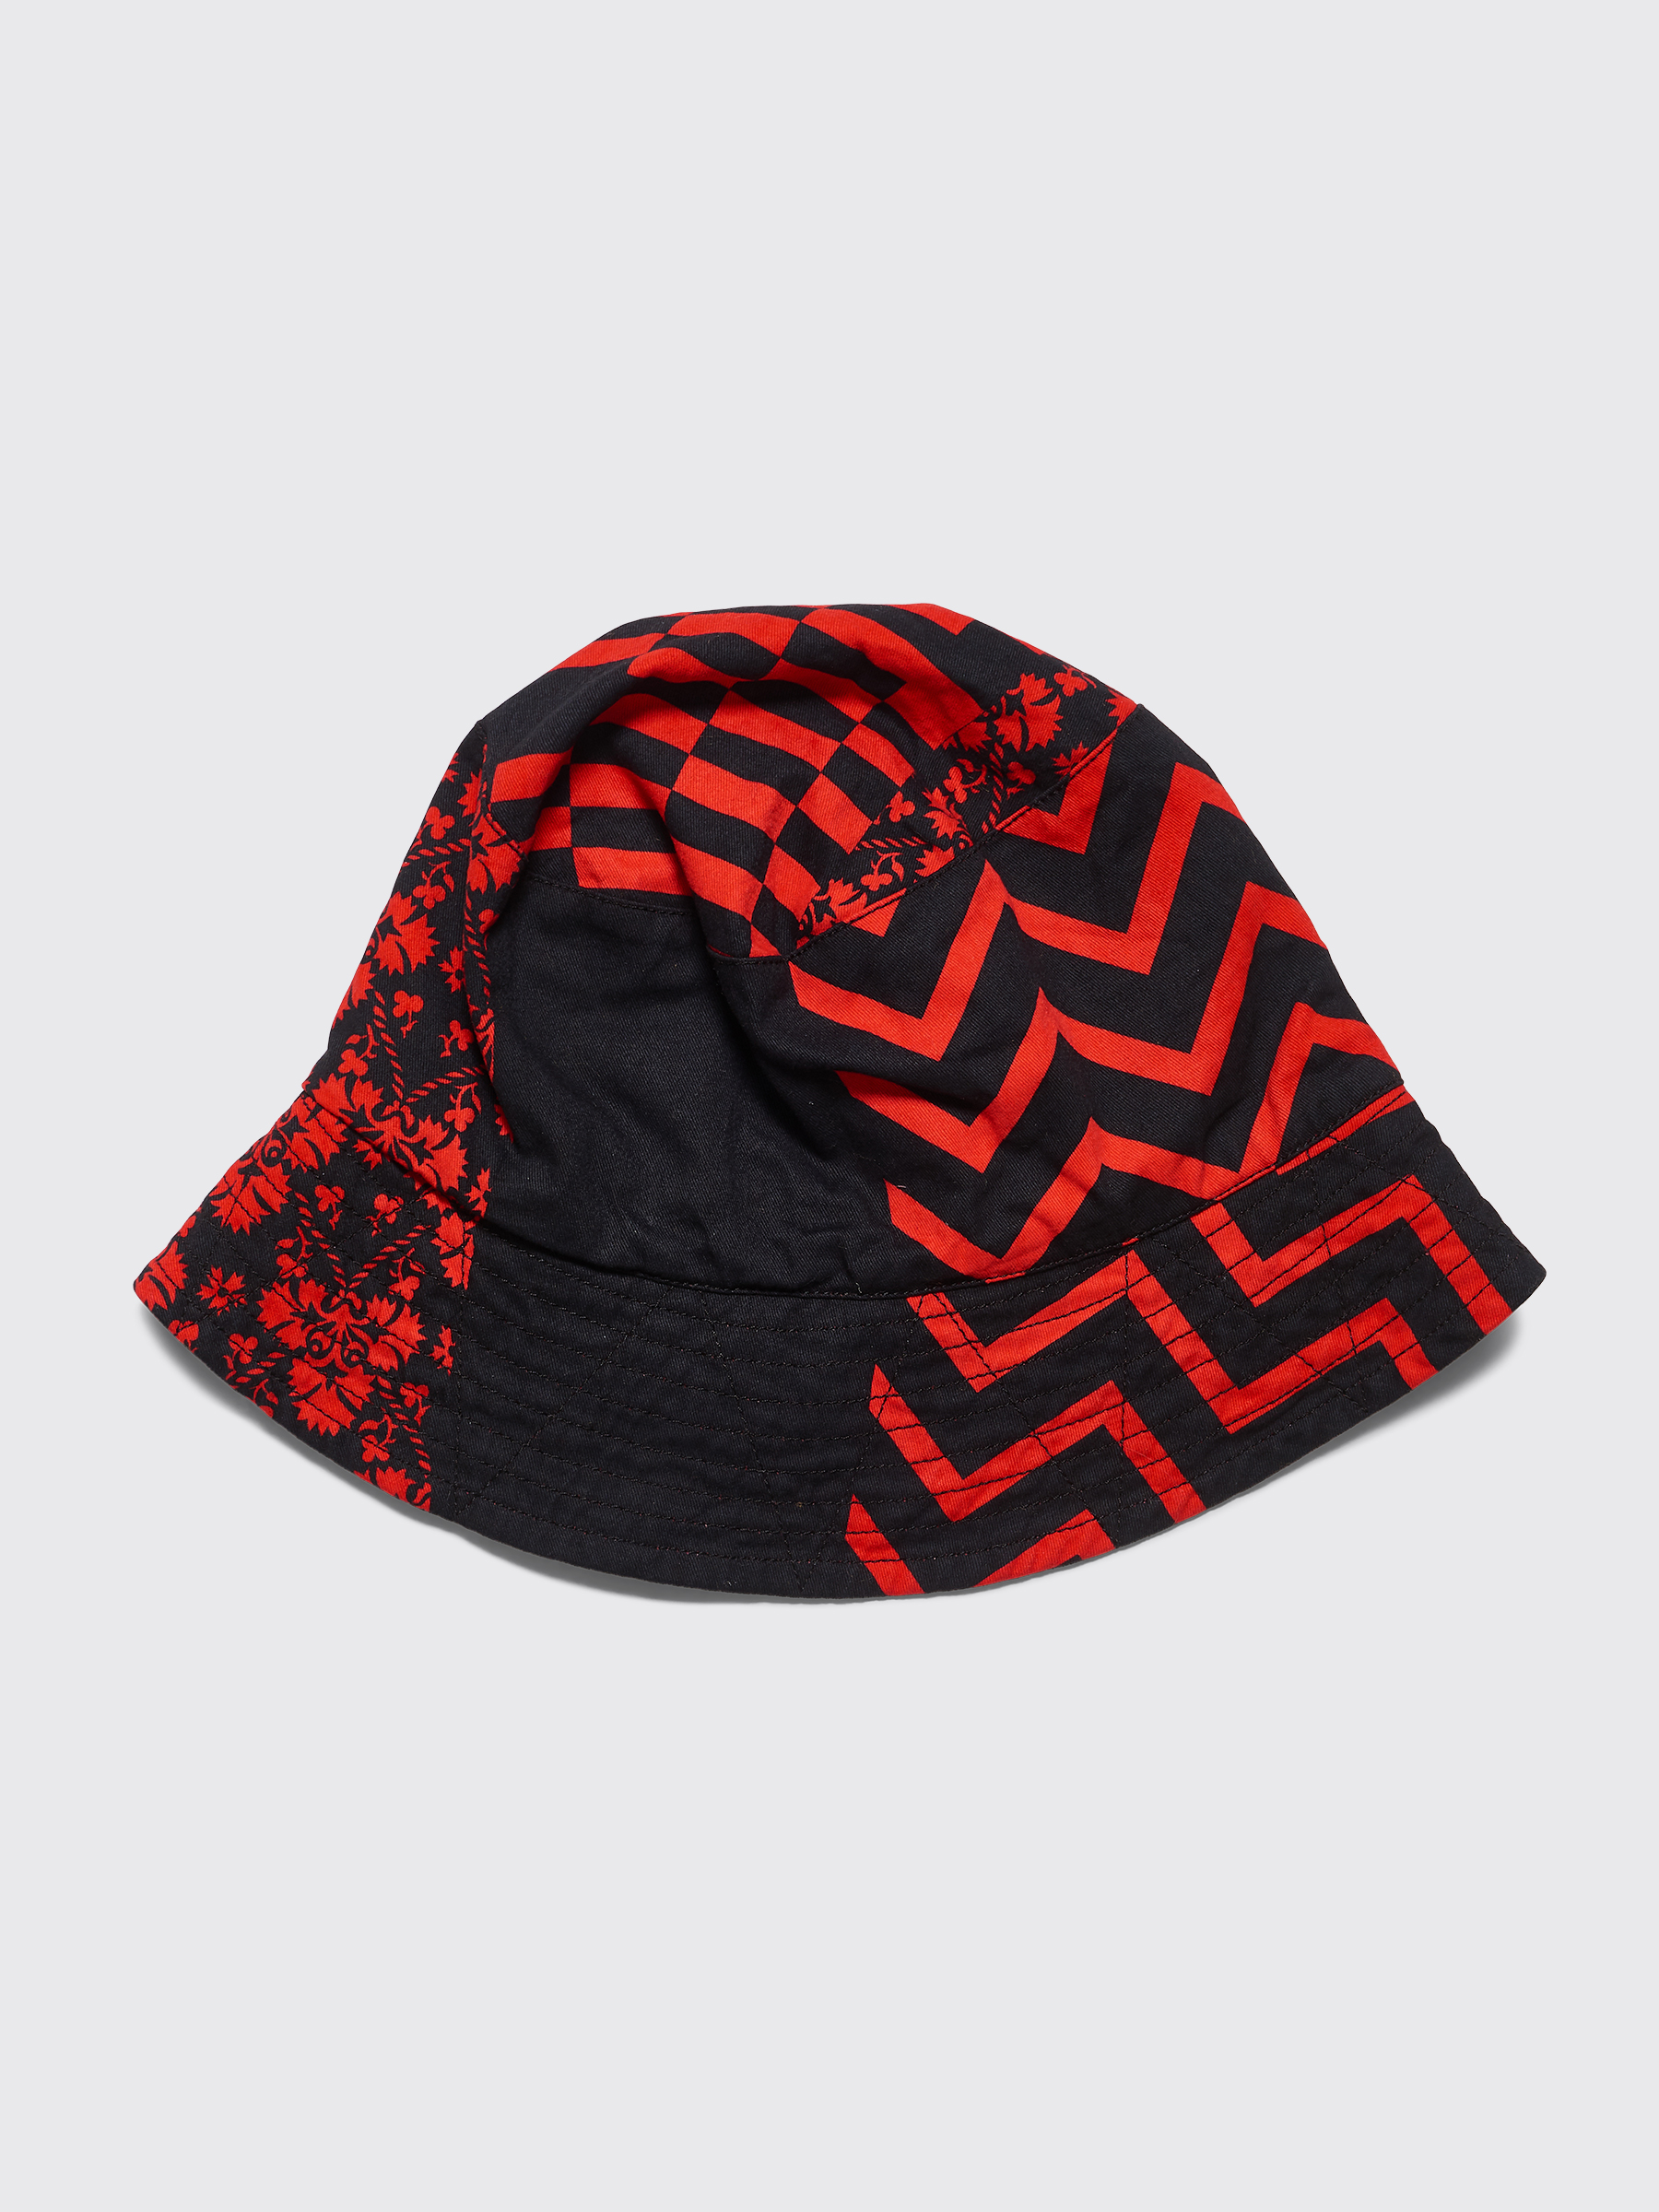 c8d7cac1 Très Bien - Engineered Garments Bucket Hat Red / Black